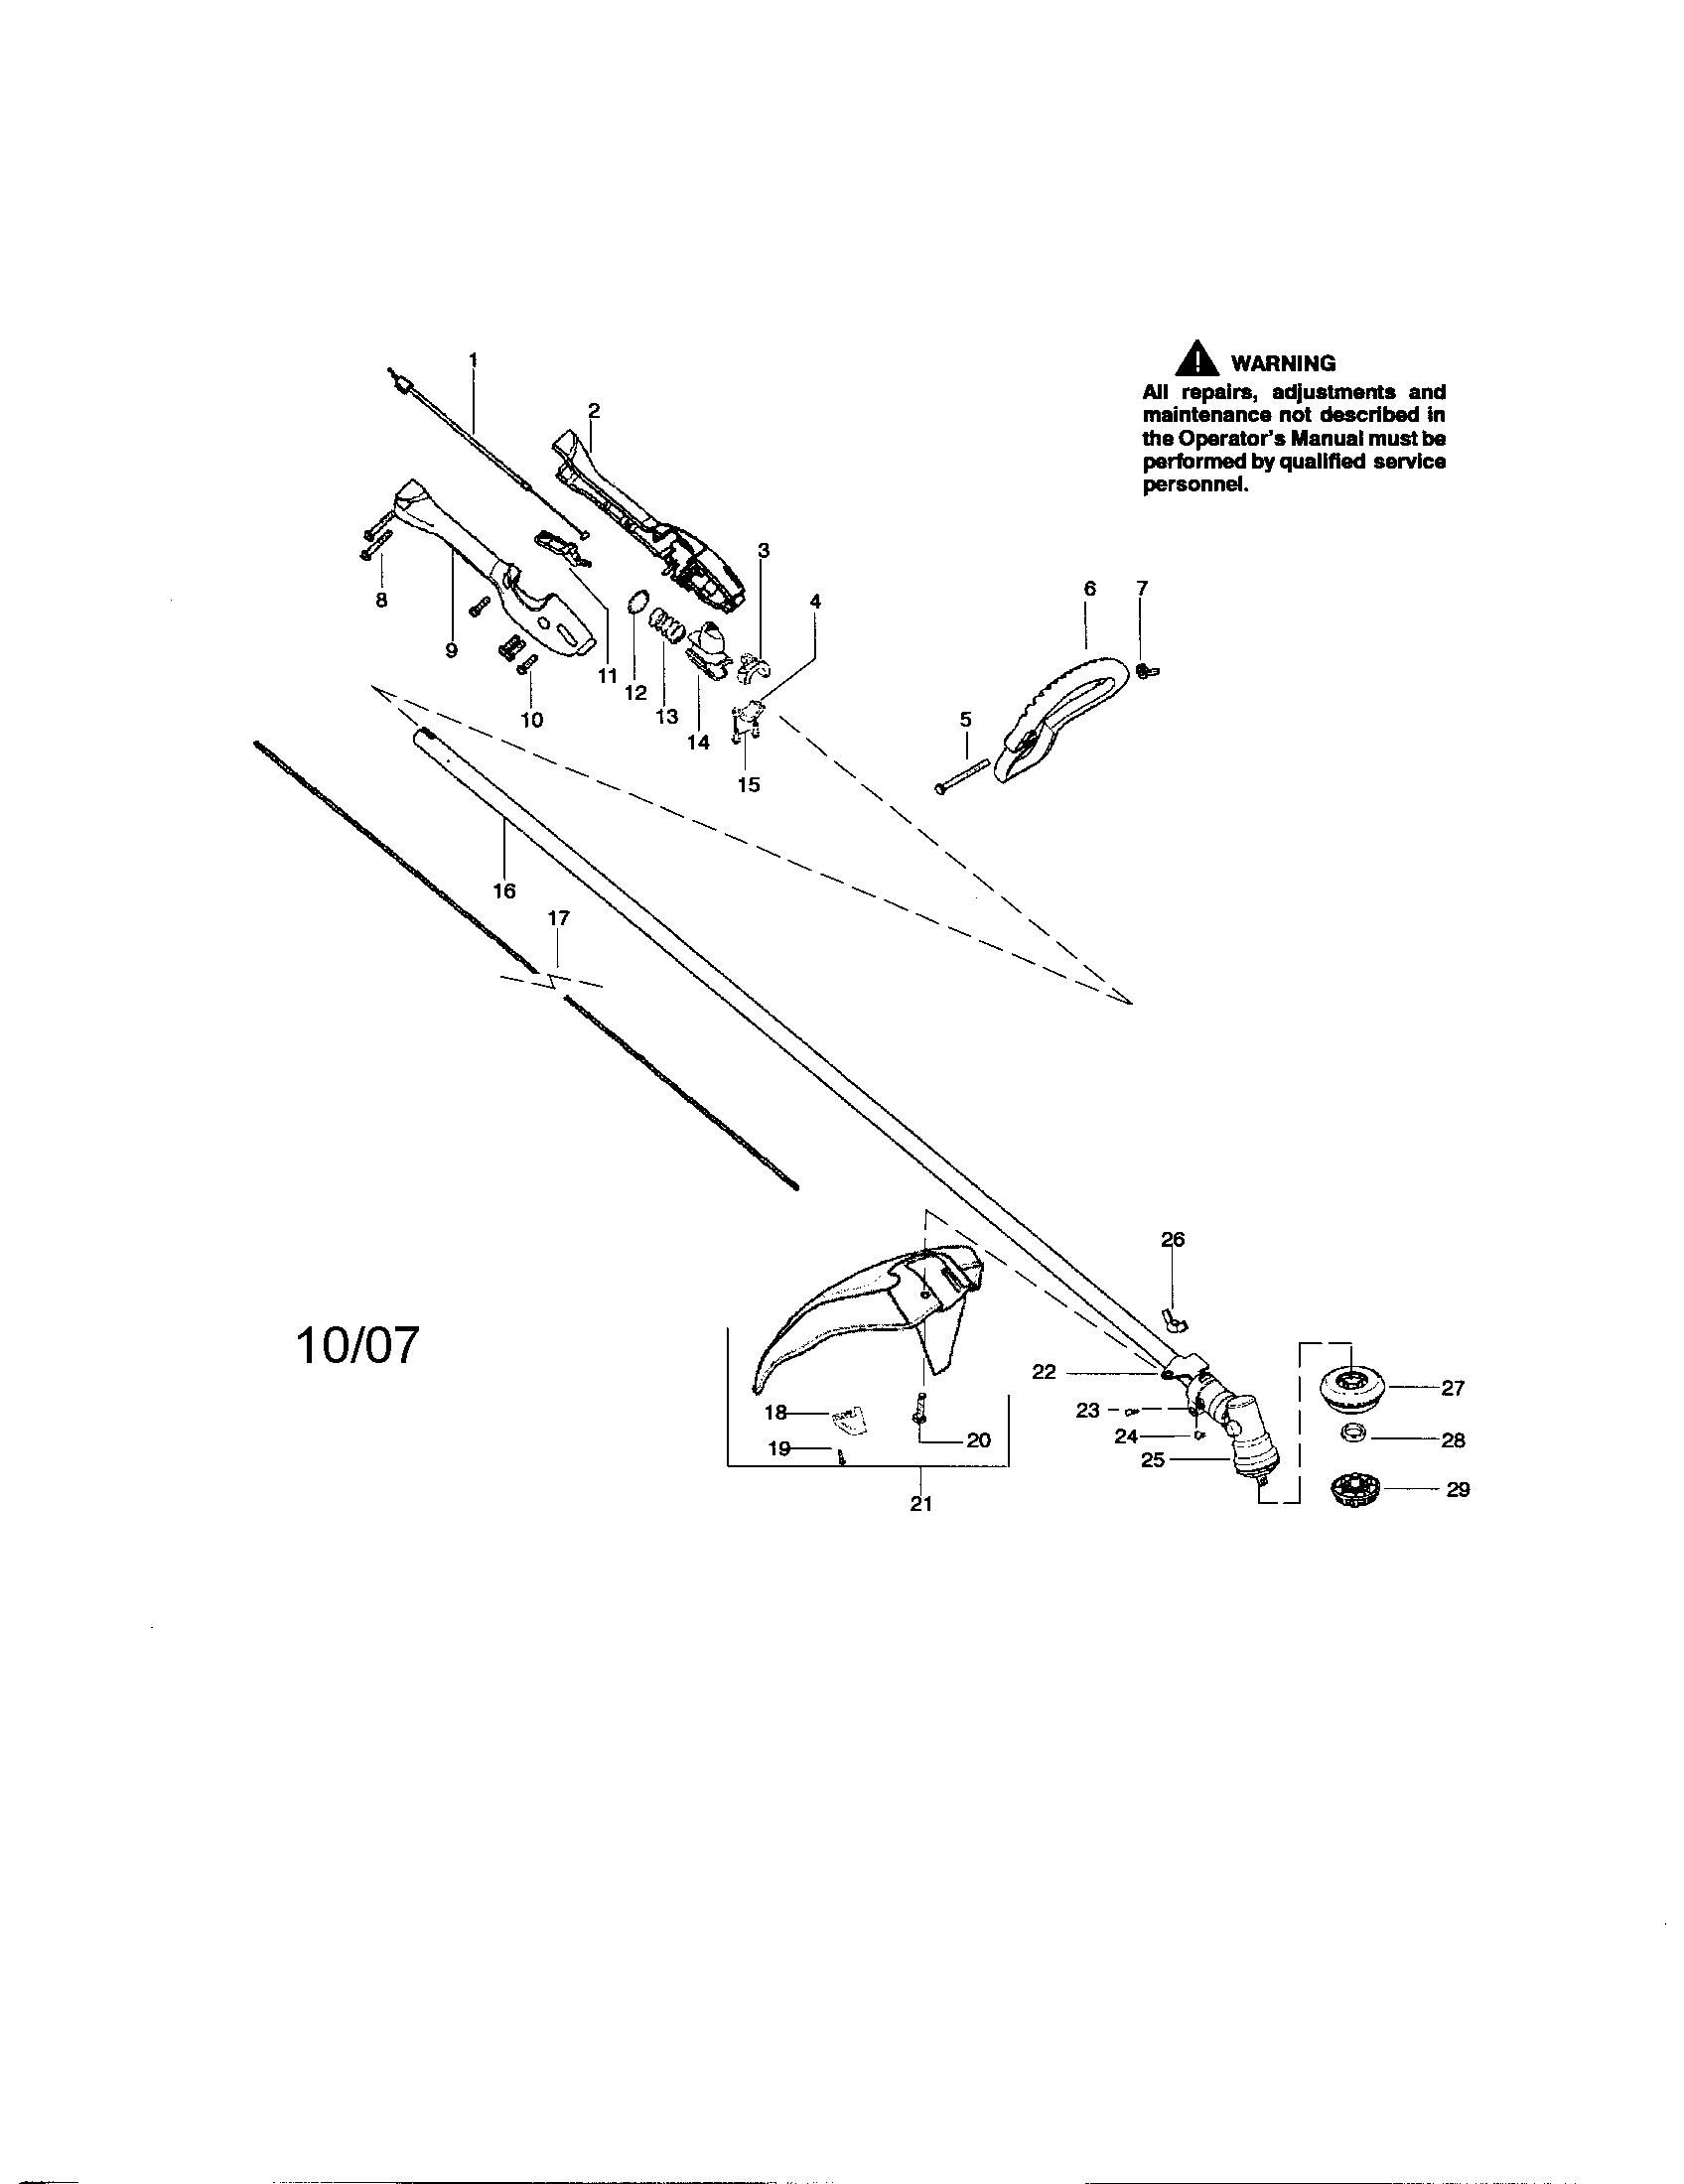 Craftsman Weed Wacker Fuel Line Diagram Craftsman Weed